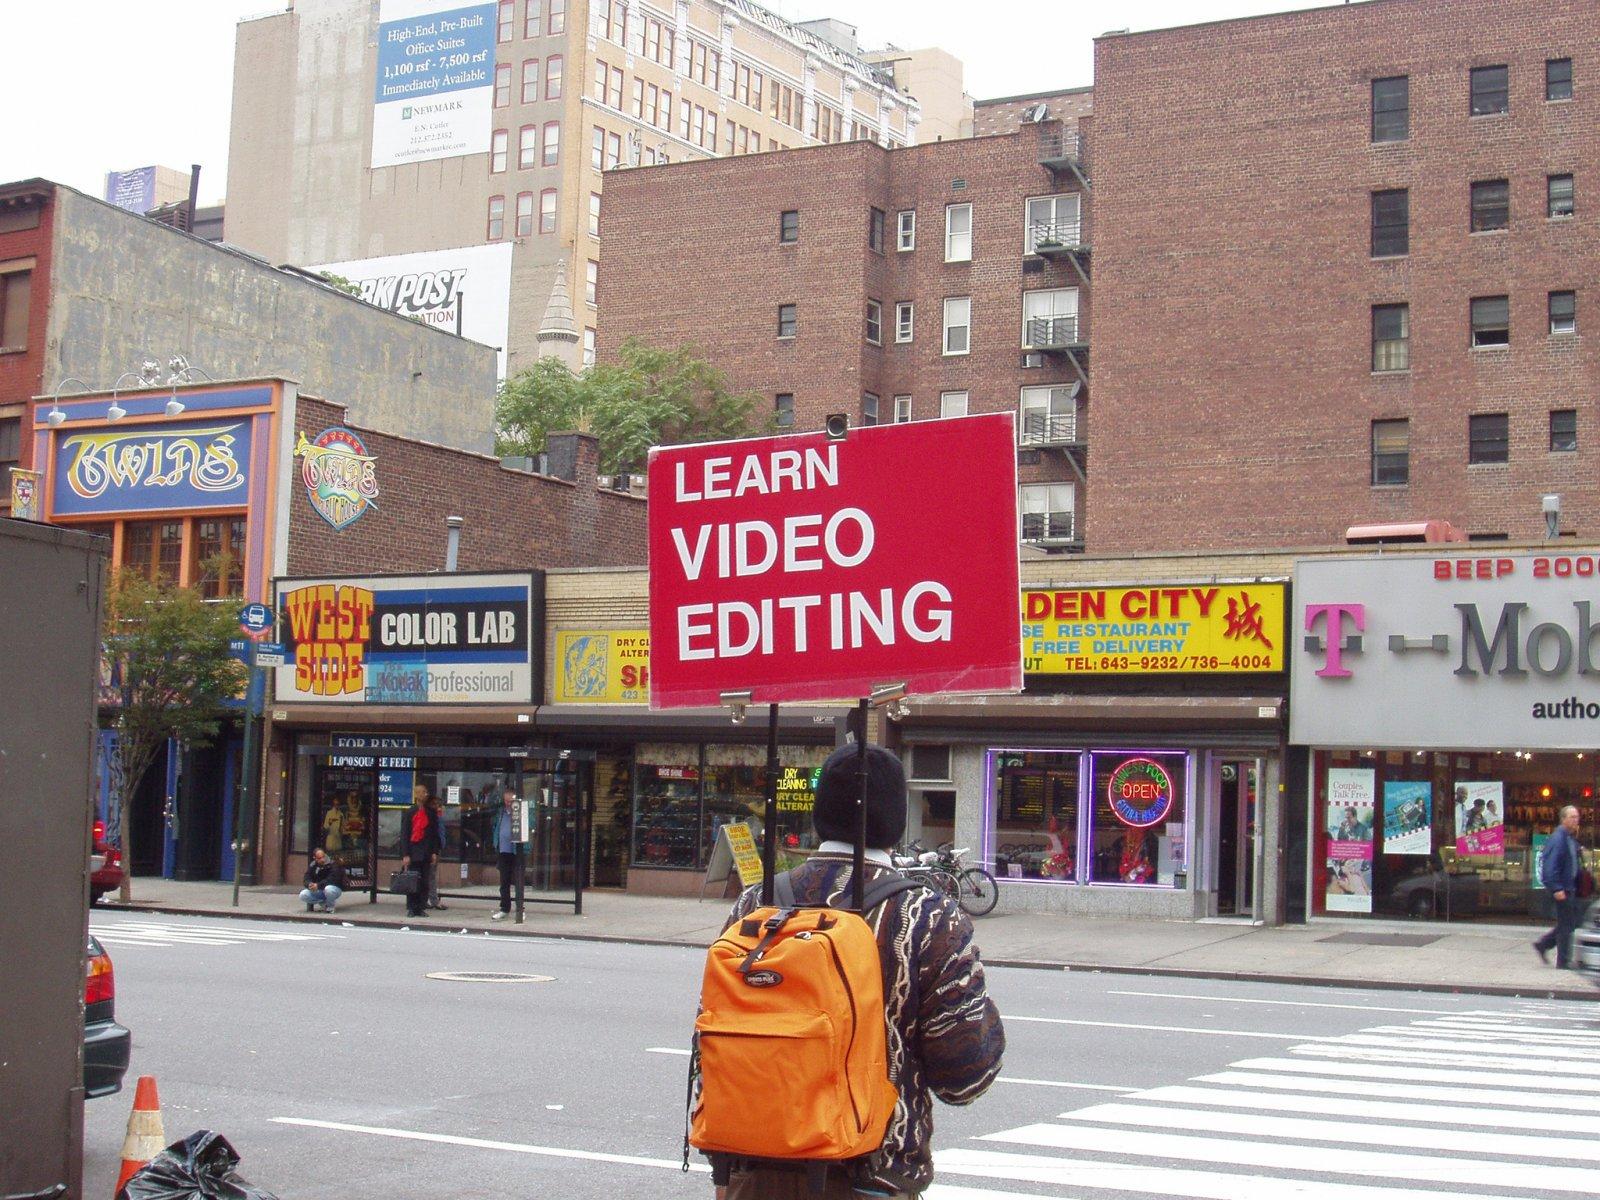 Ron Terada,Learn Video Editing, 2004, digital c-print, 13 x 15 in. (33 x 38 cm)